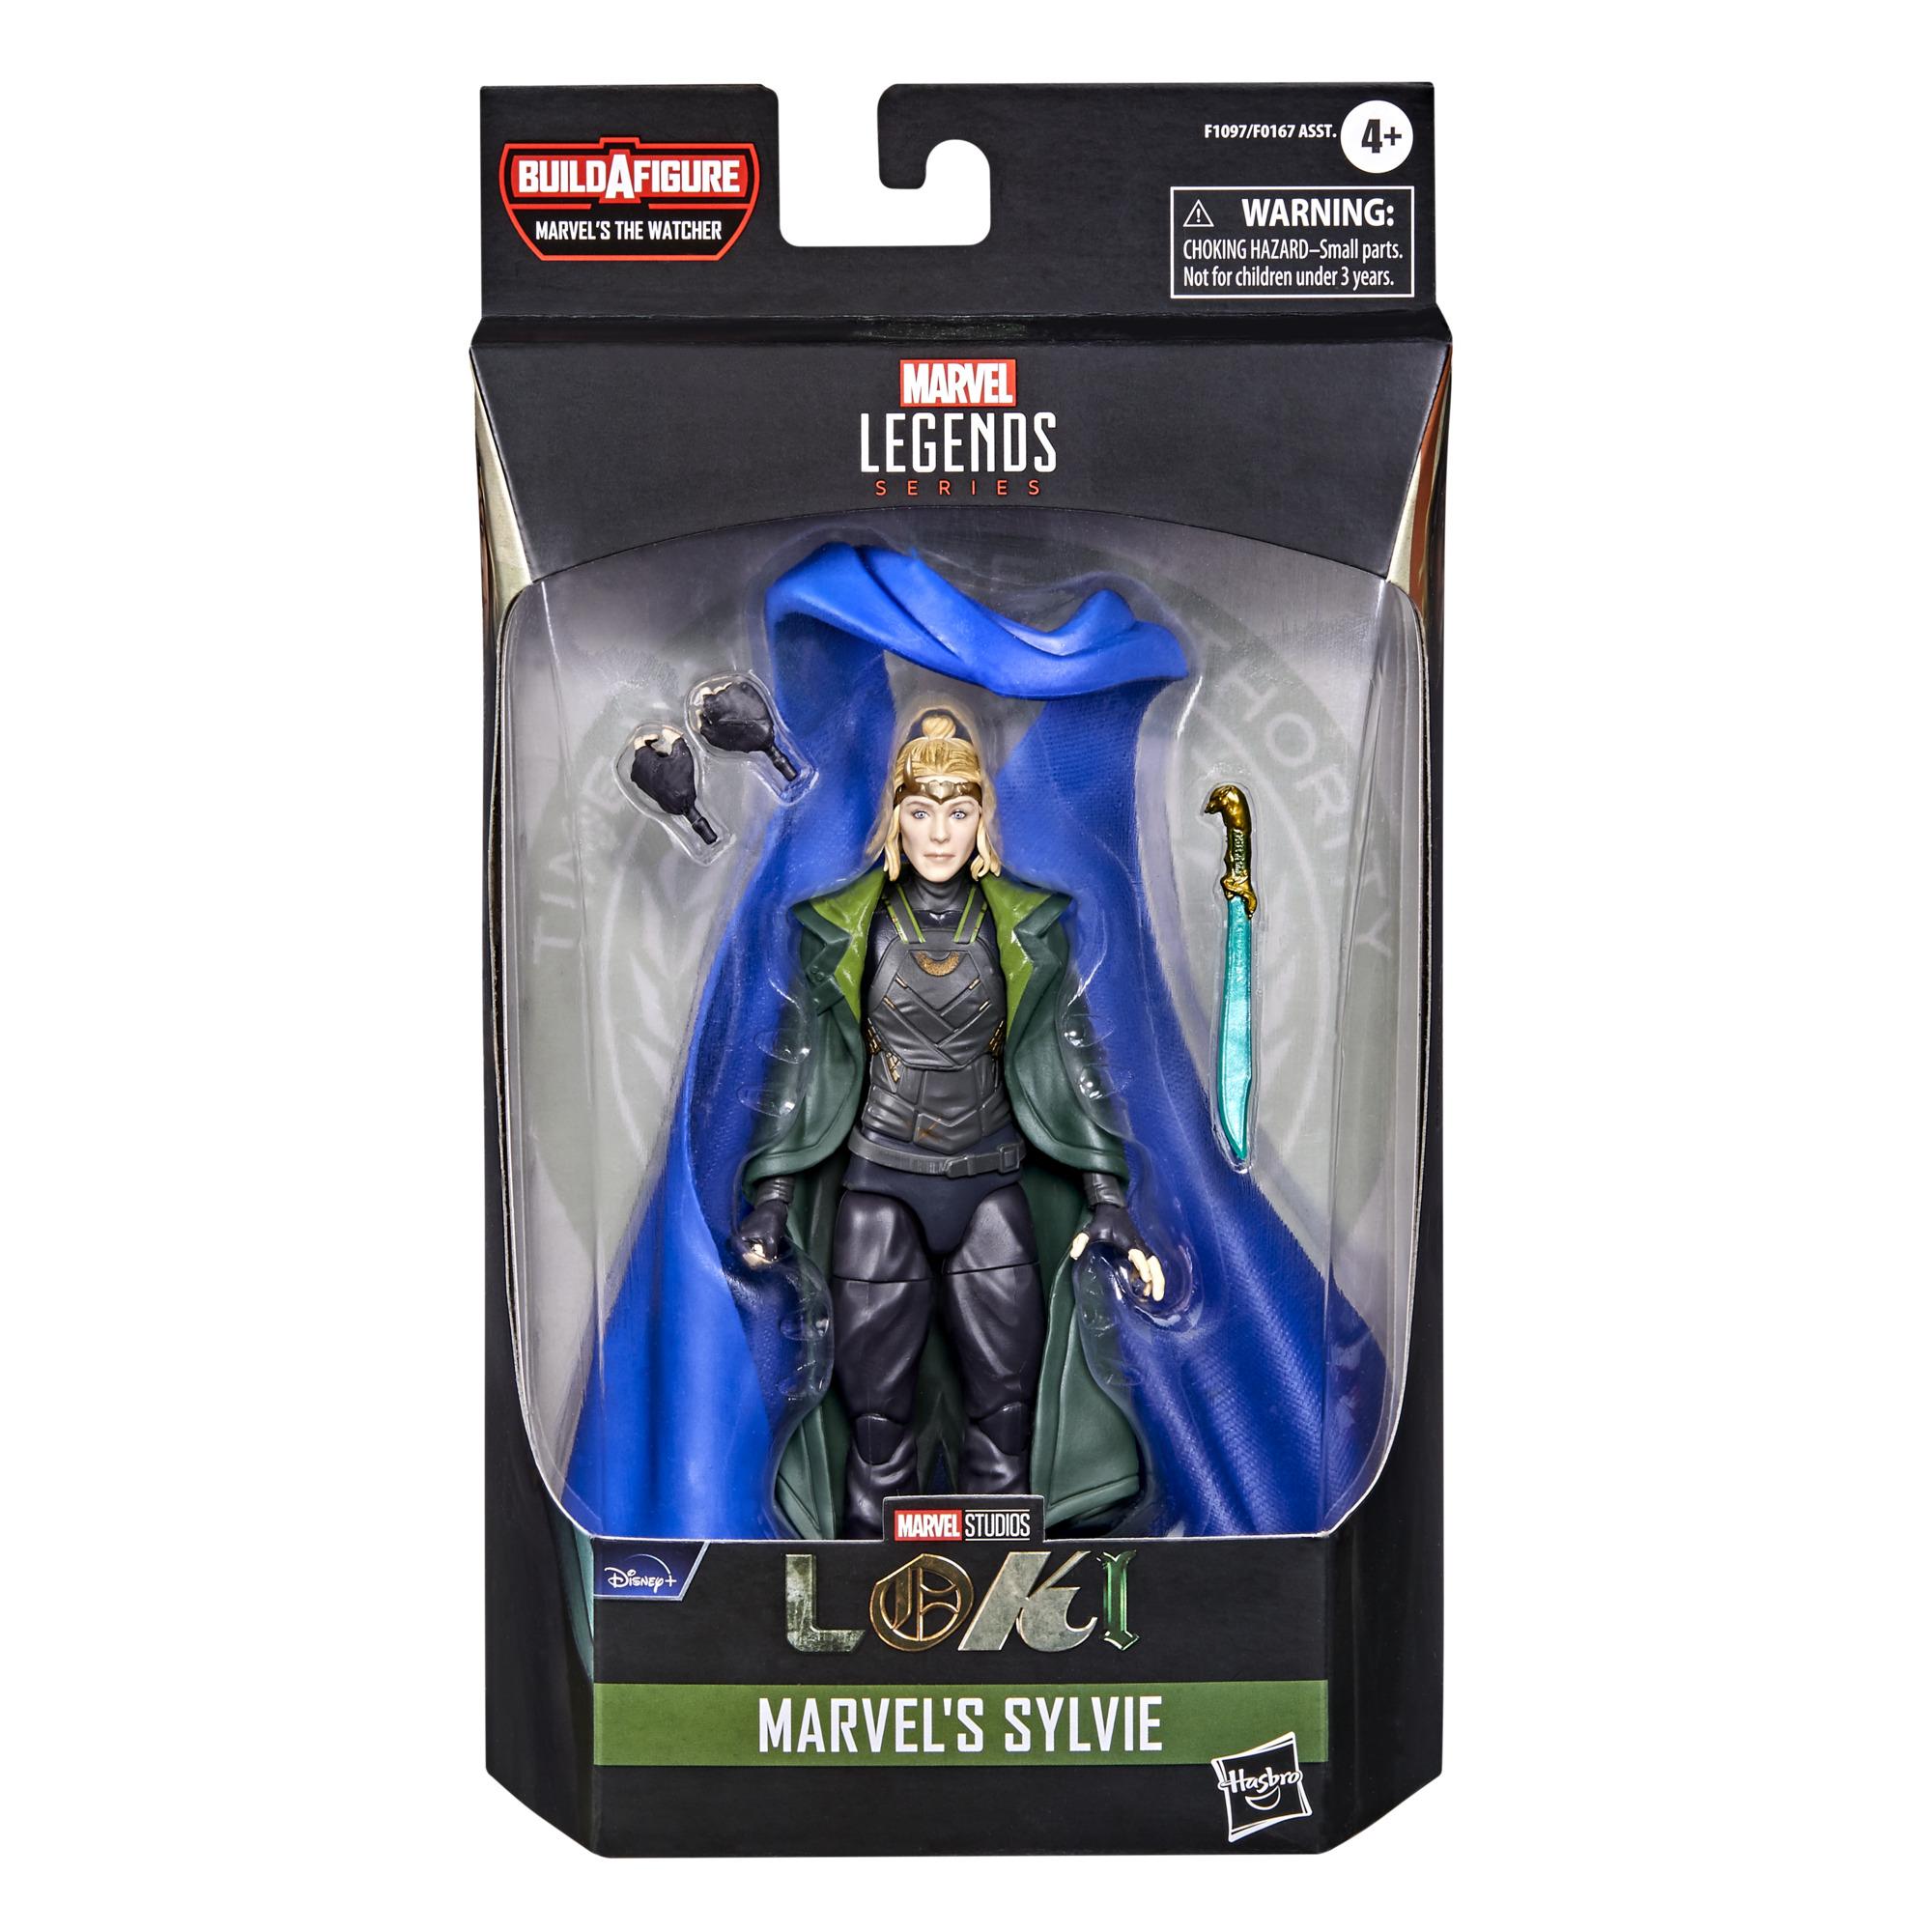 Marvel Legends Series Marvel's Sylvie